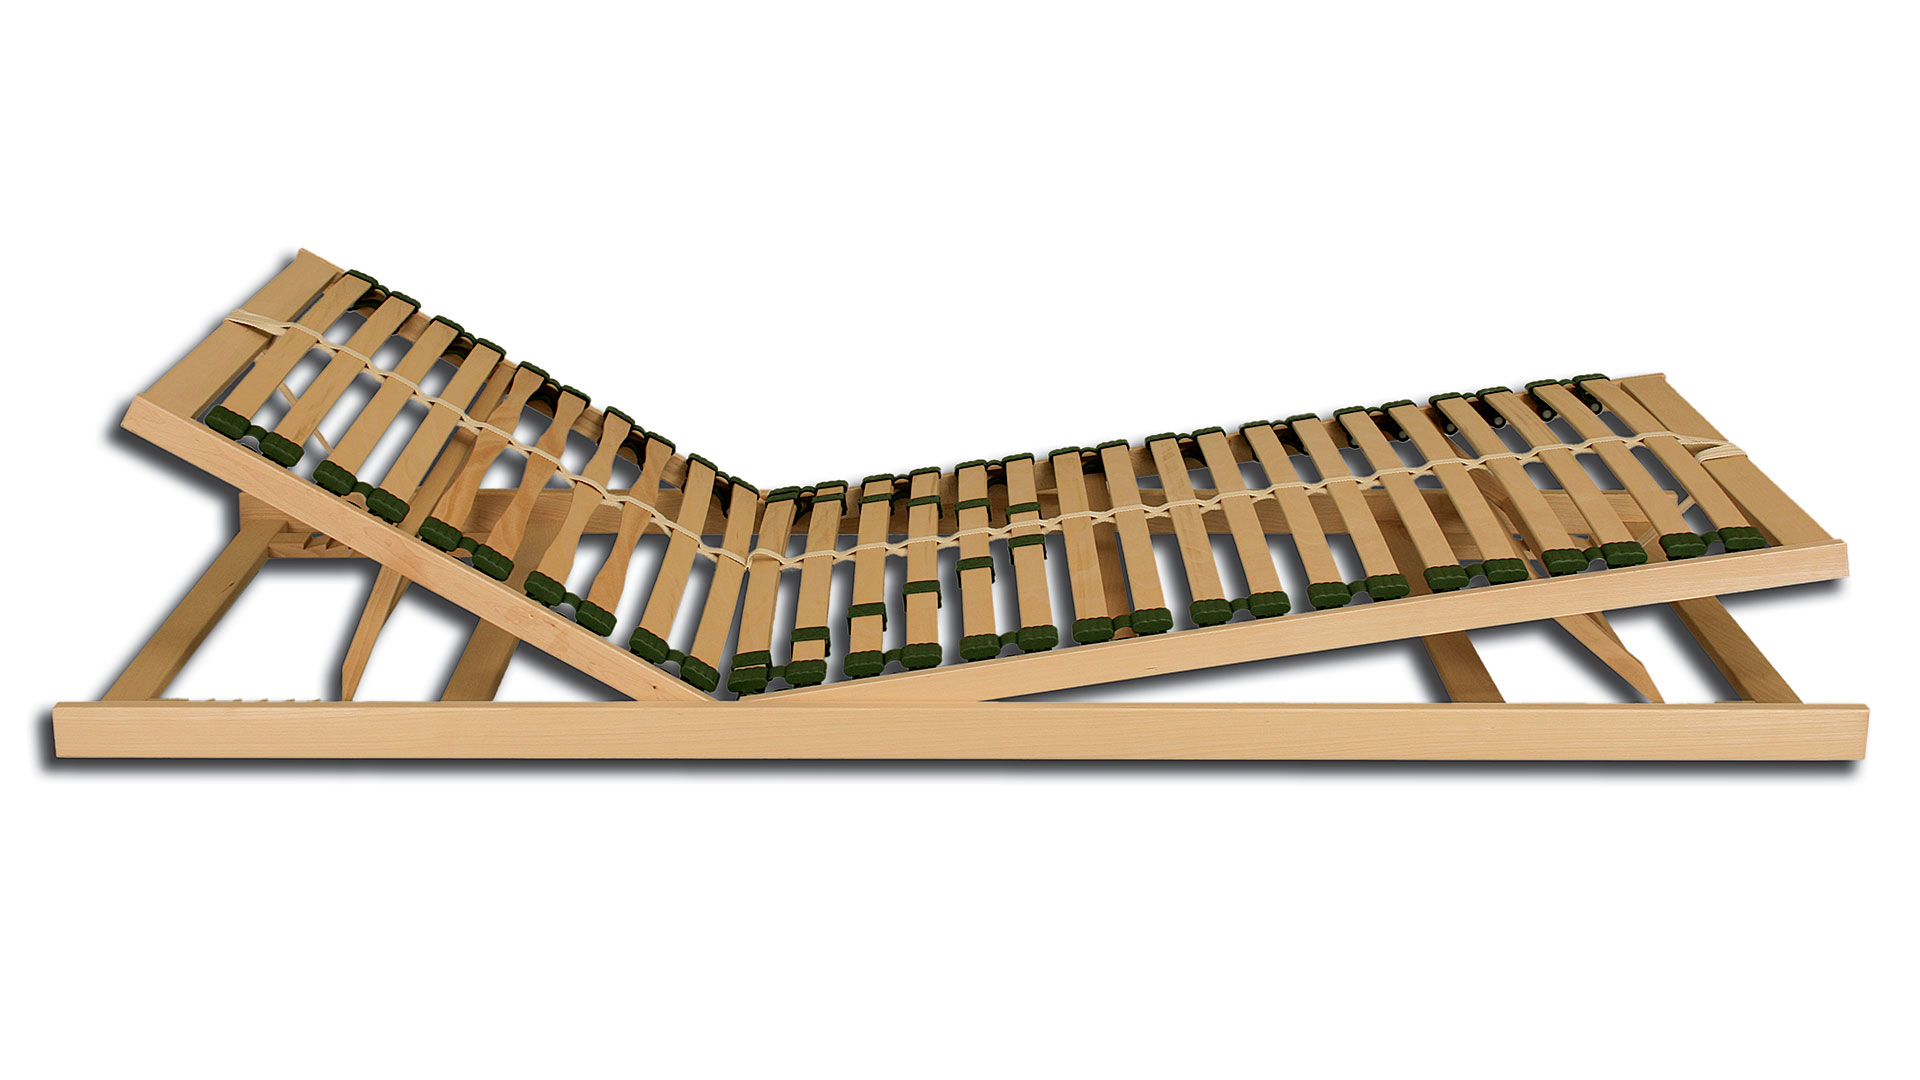 Full Size of Bett Mit Elektrisch Verstellbarem Lattenrost Gebraucht Malm Knarrt Verstellbaren Ikea Und Matratze 140x200 160x200 120x200 Befestigen Komplett Inklusive Bett Bett Lattenrost